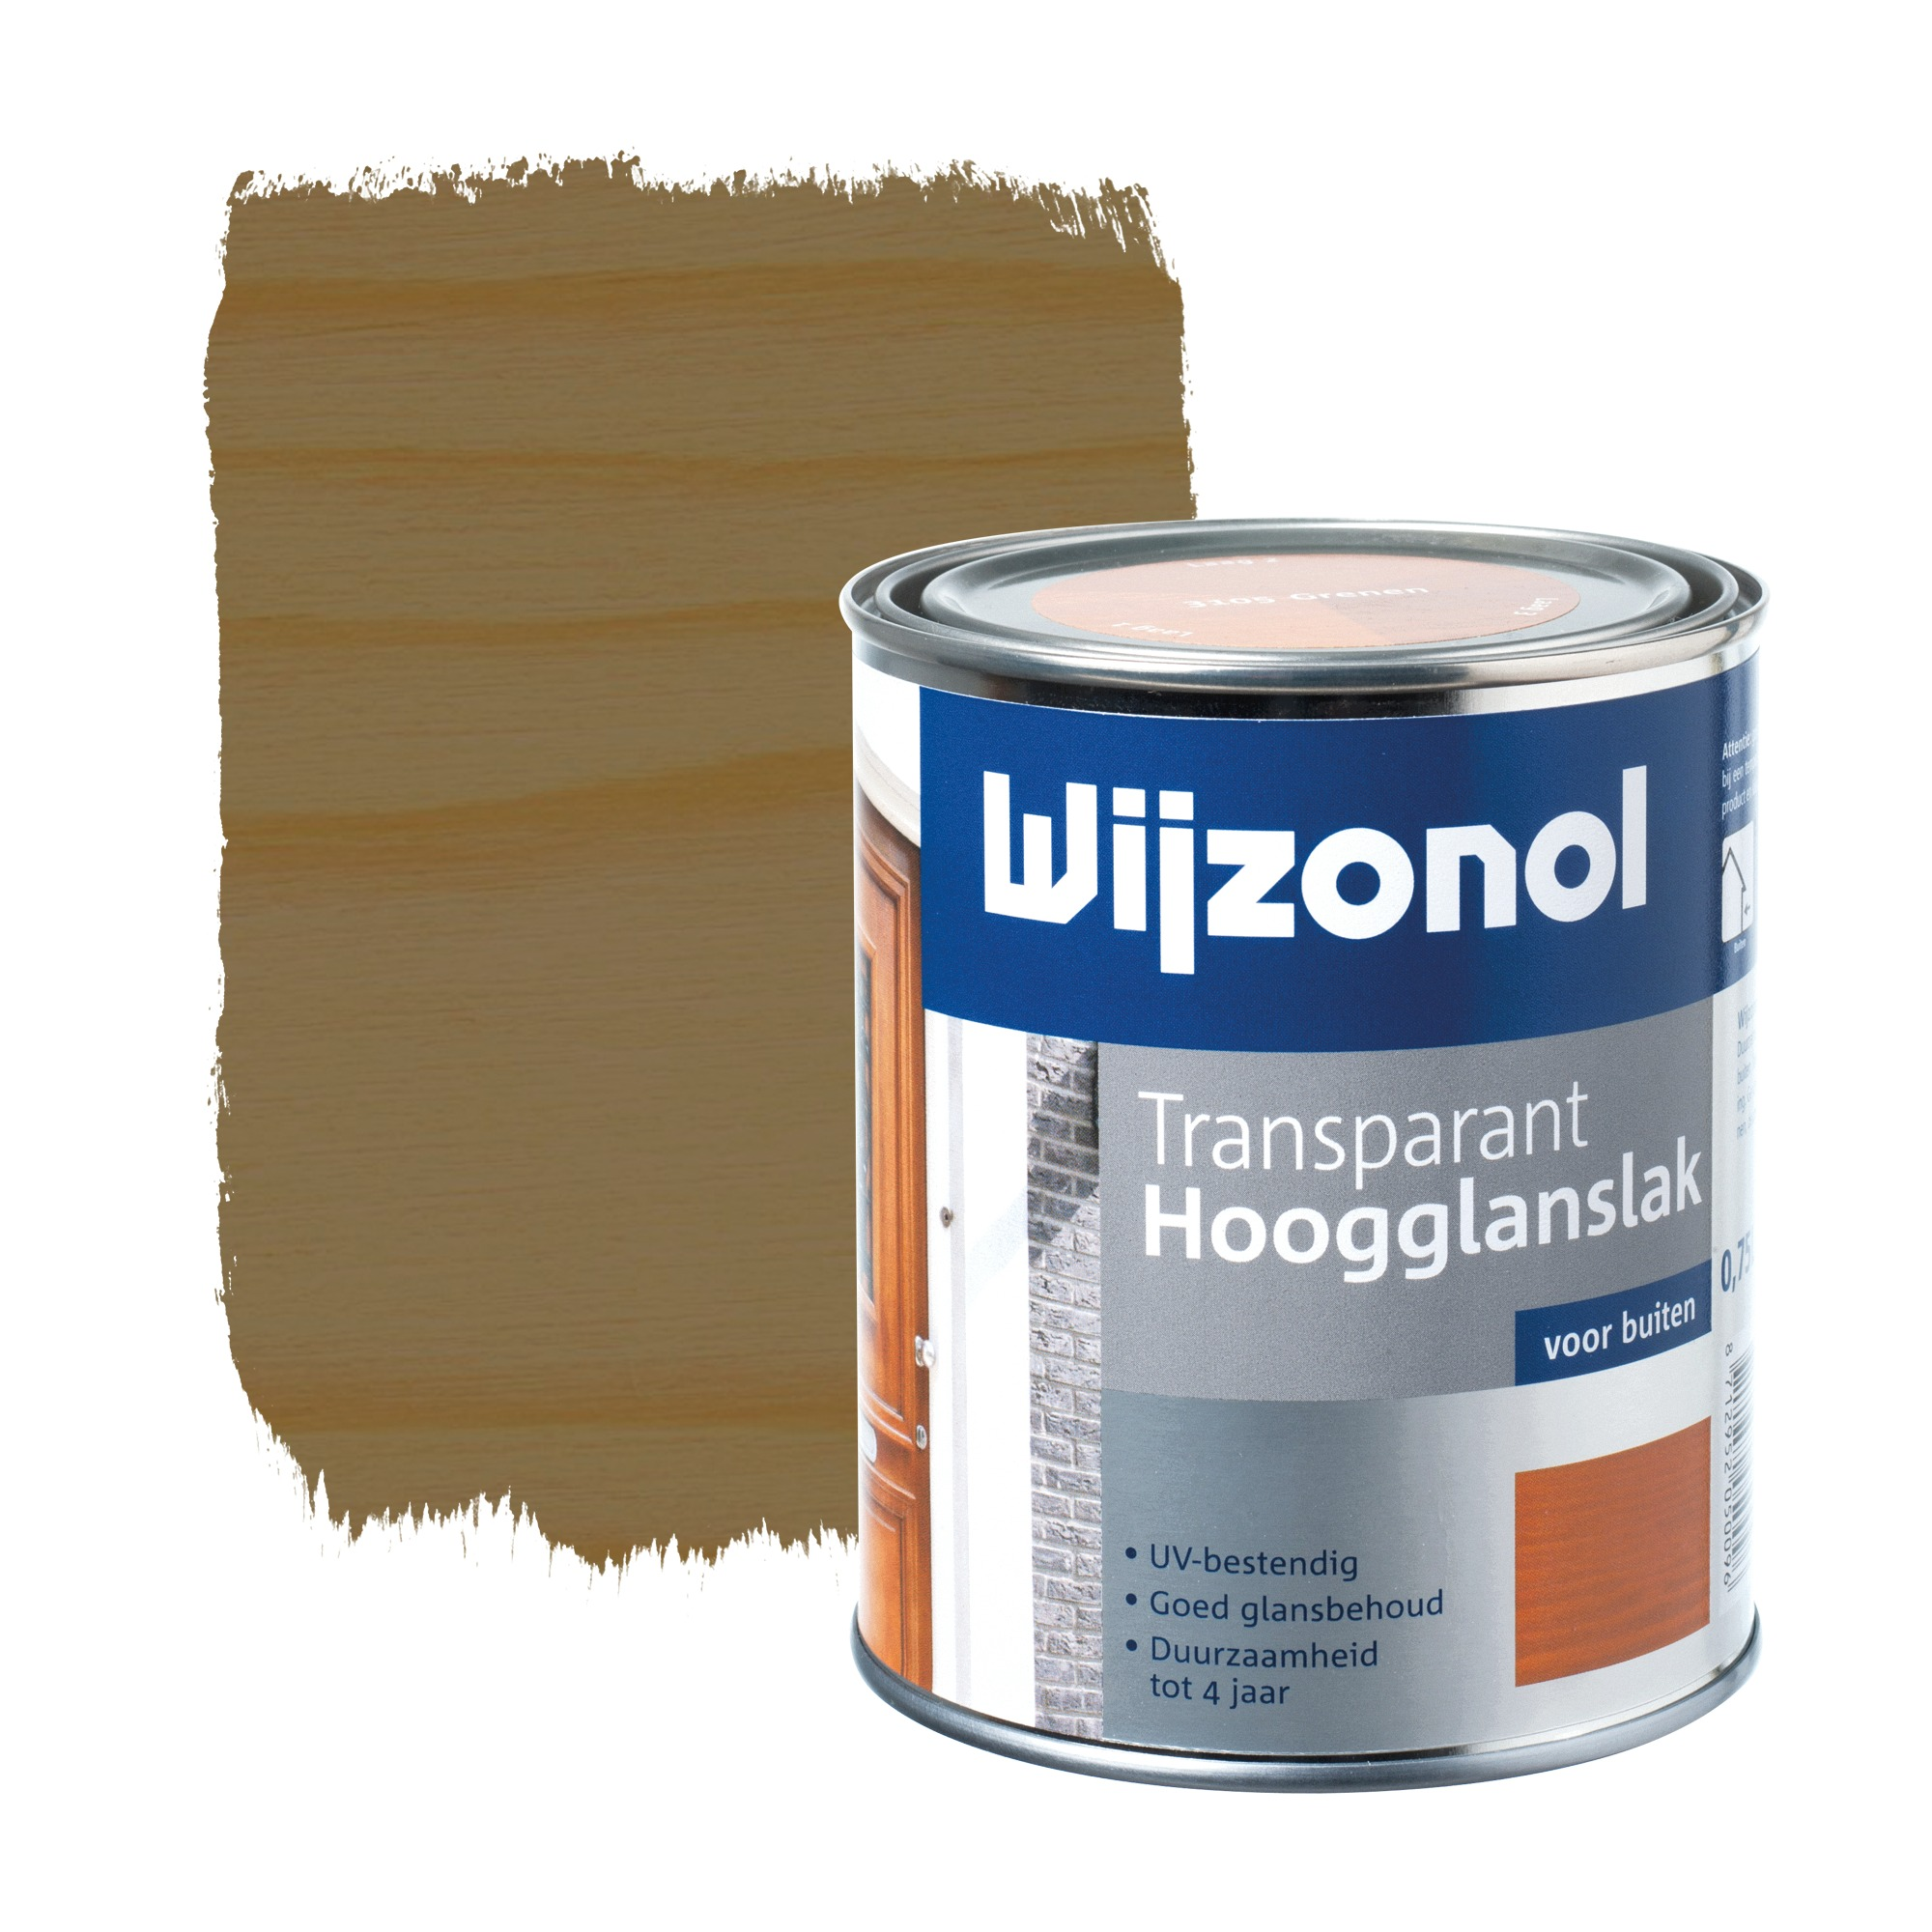 Wijzonol rm buitenverf hoogglans transparant alkyd noten 3125 750 ml